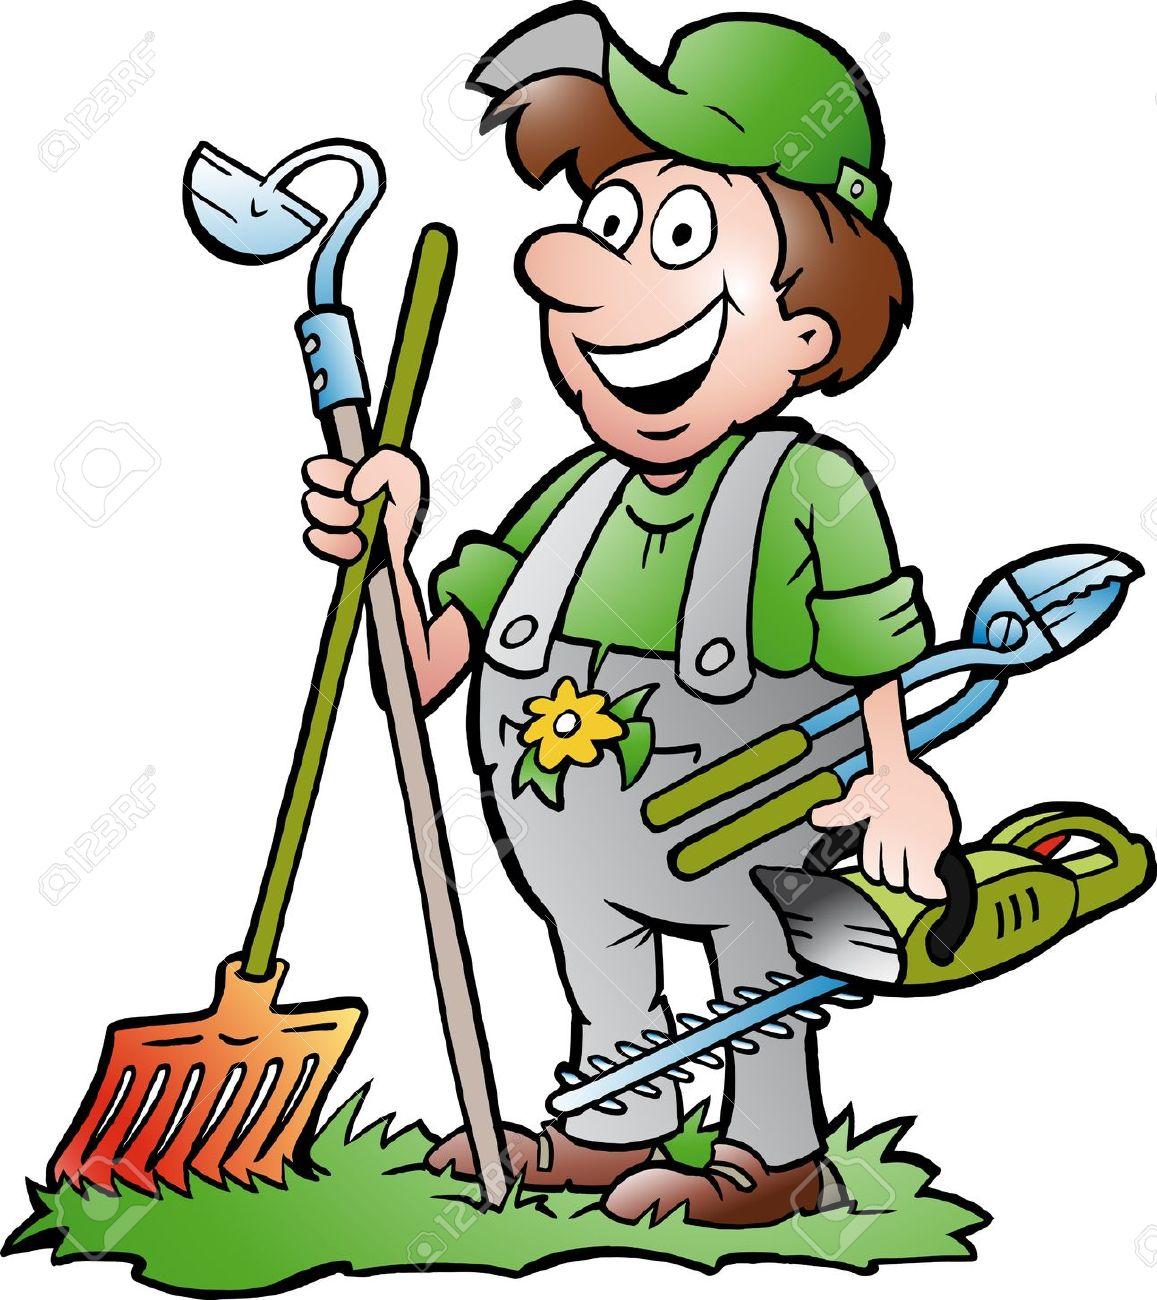 gardener: Hand-drawn Vector .